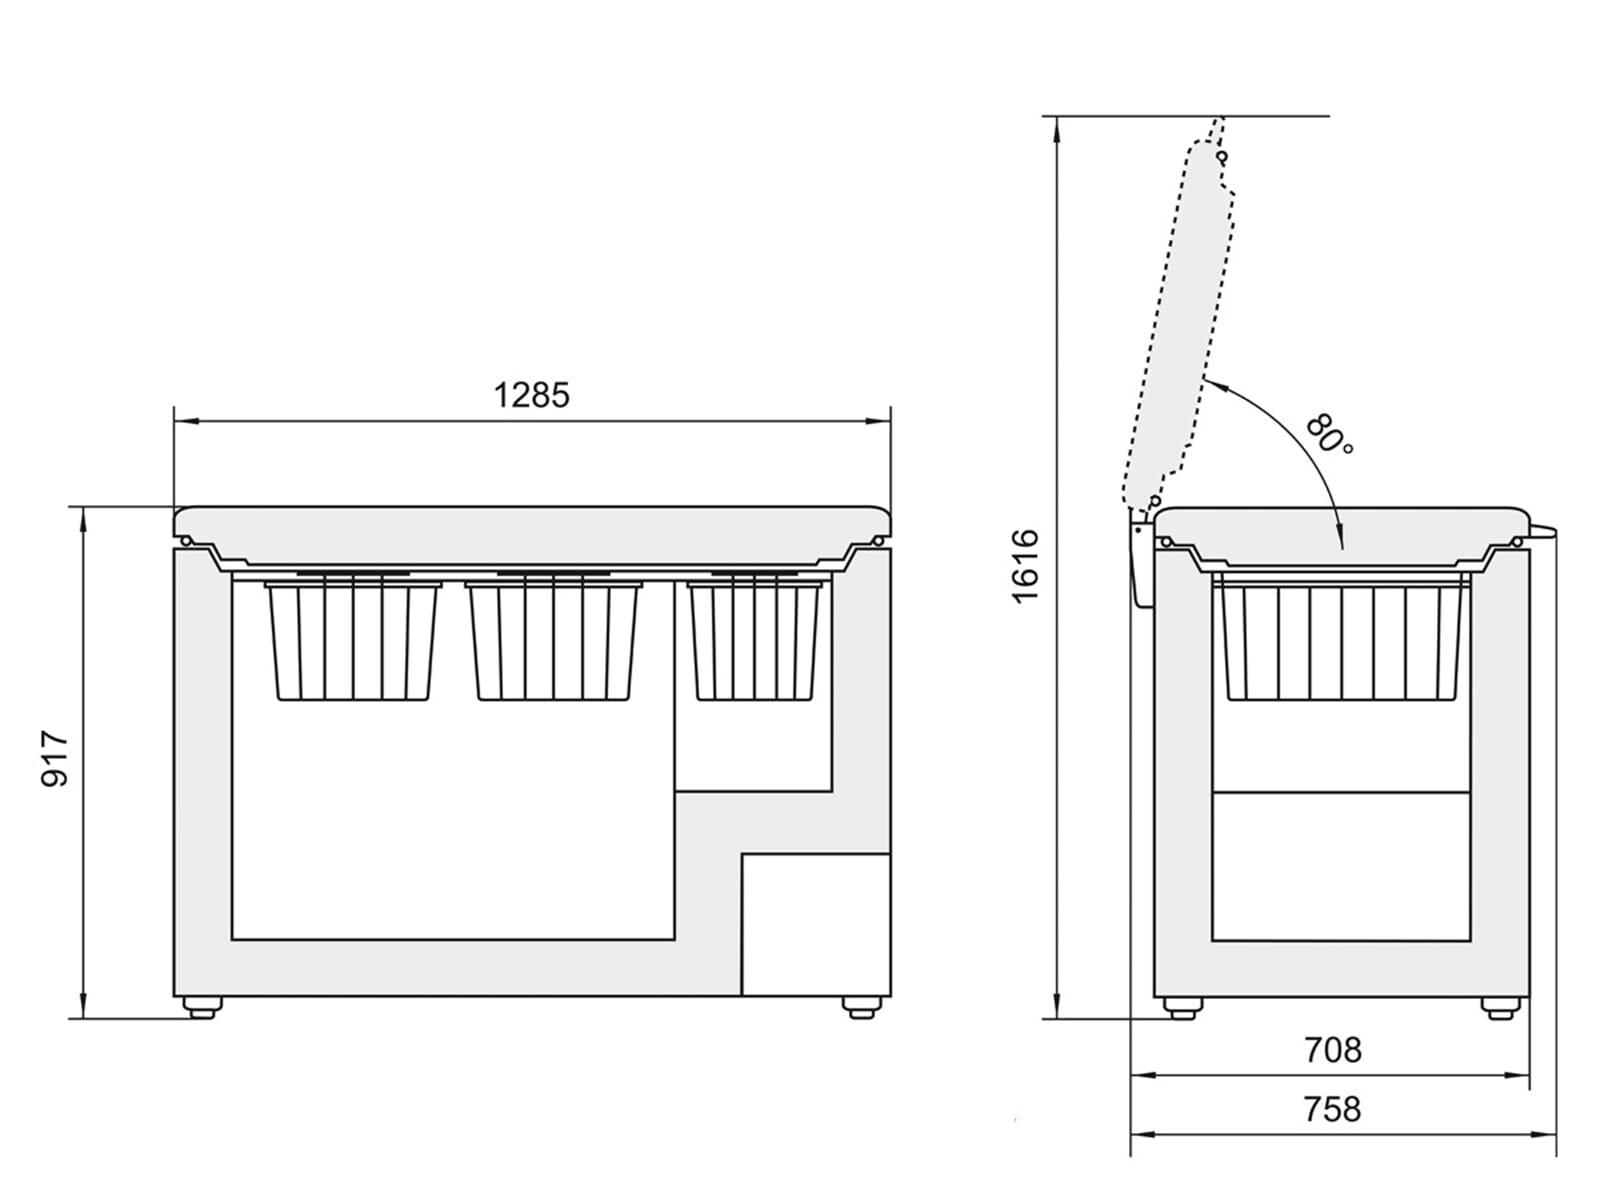 liebherr gtp2756 gefriertruhe wei f r 724 90 eur shop. Black Bedroom Furniture Sets. Home Design Ideas